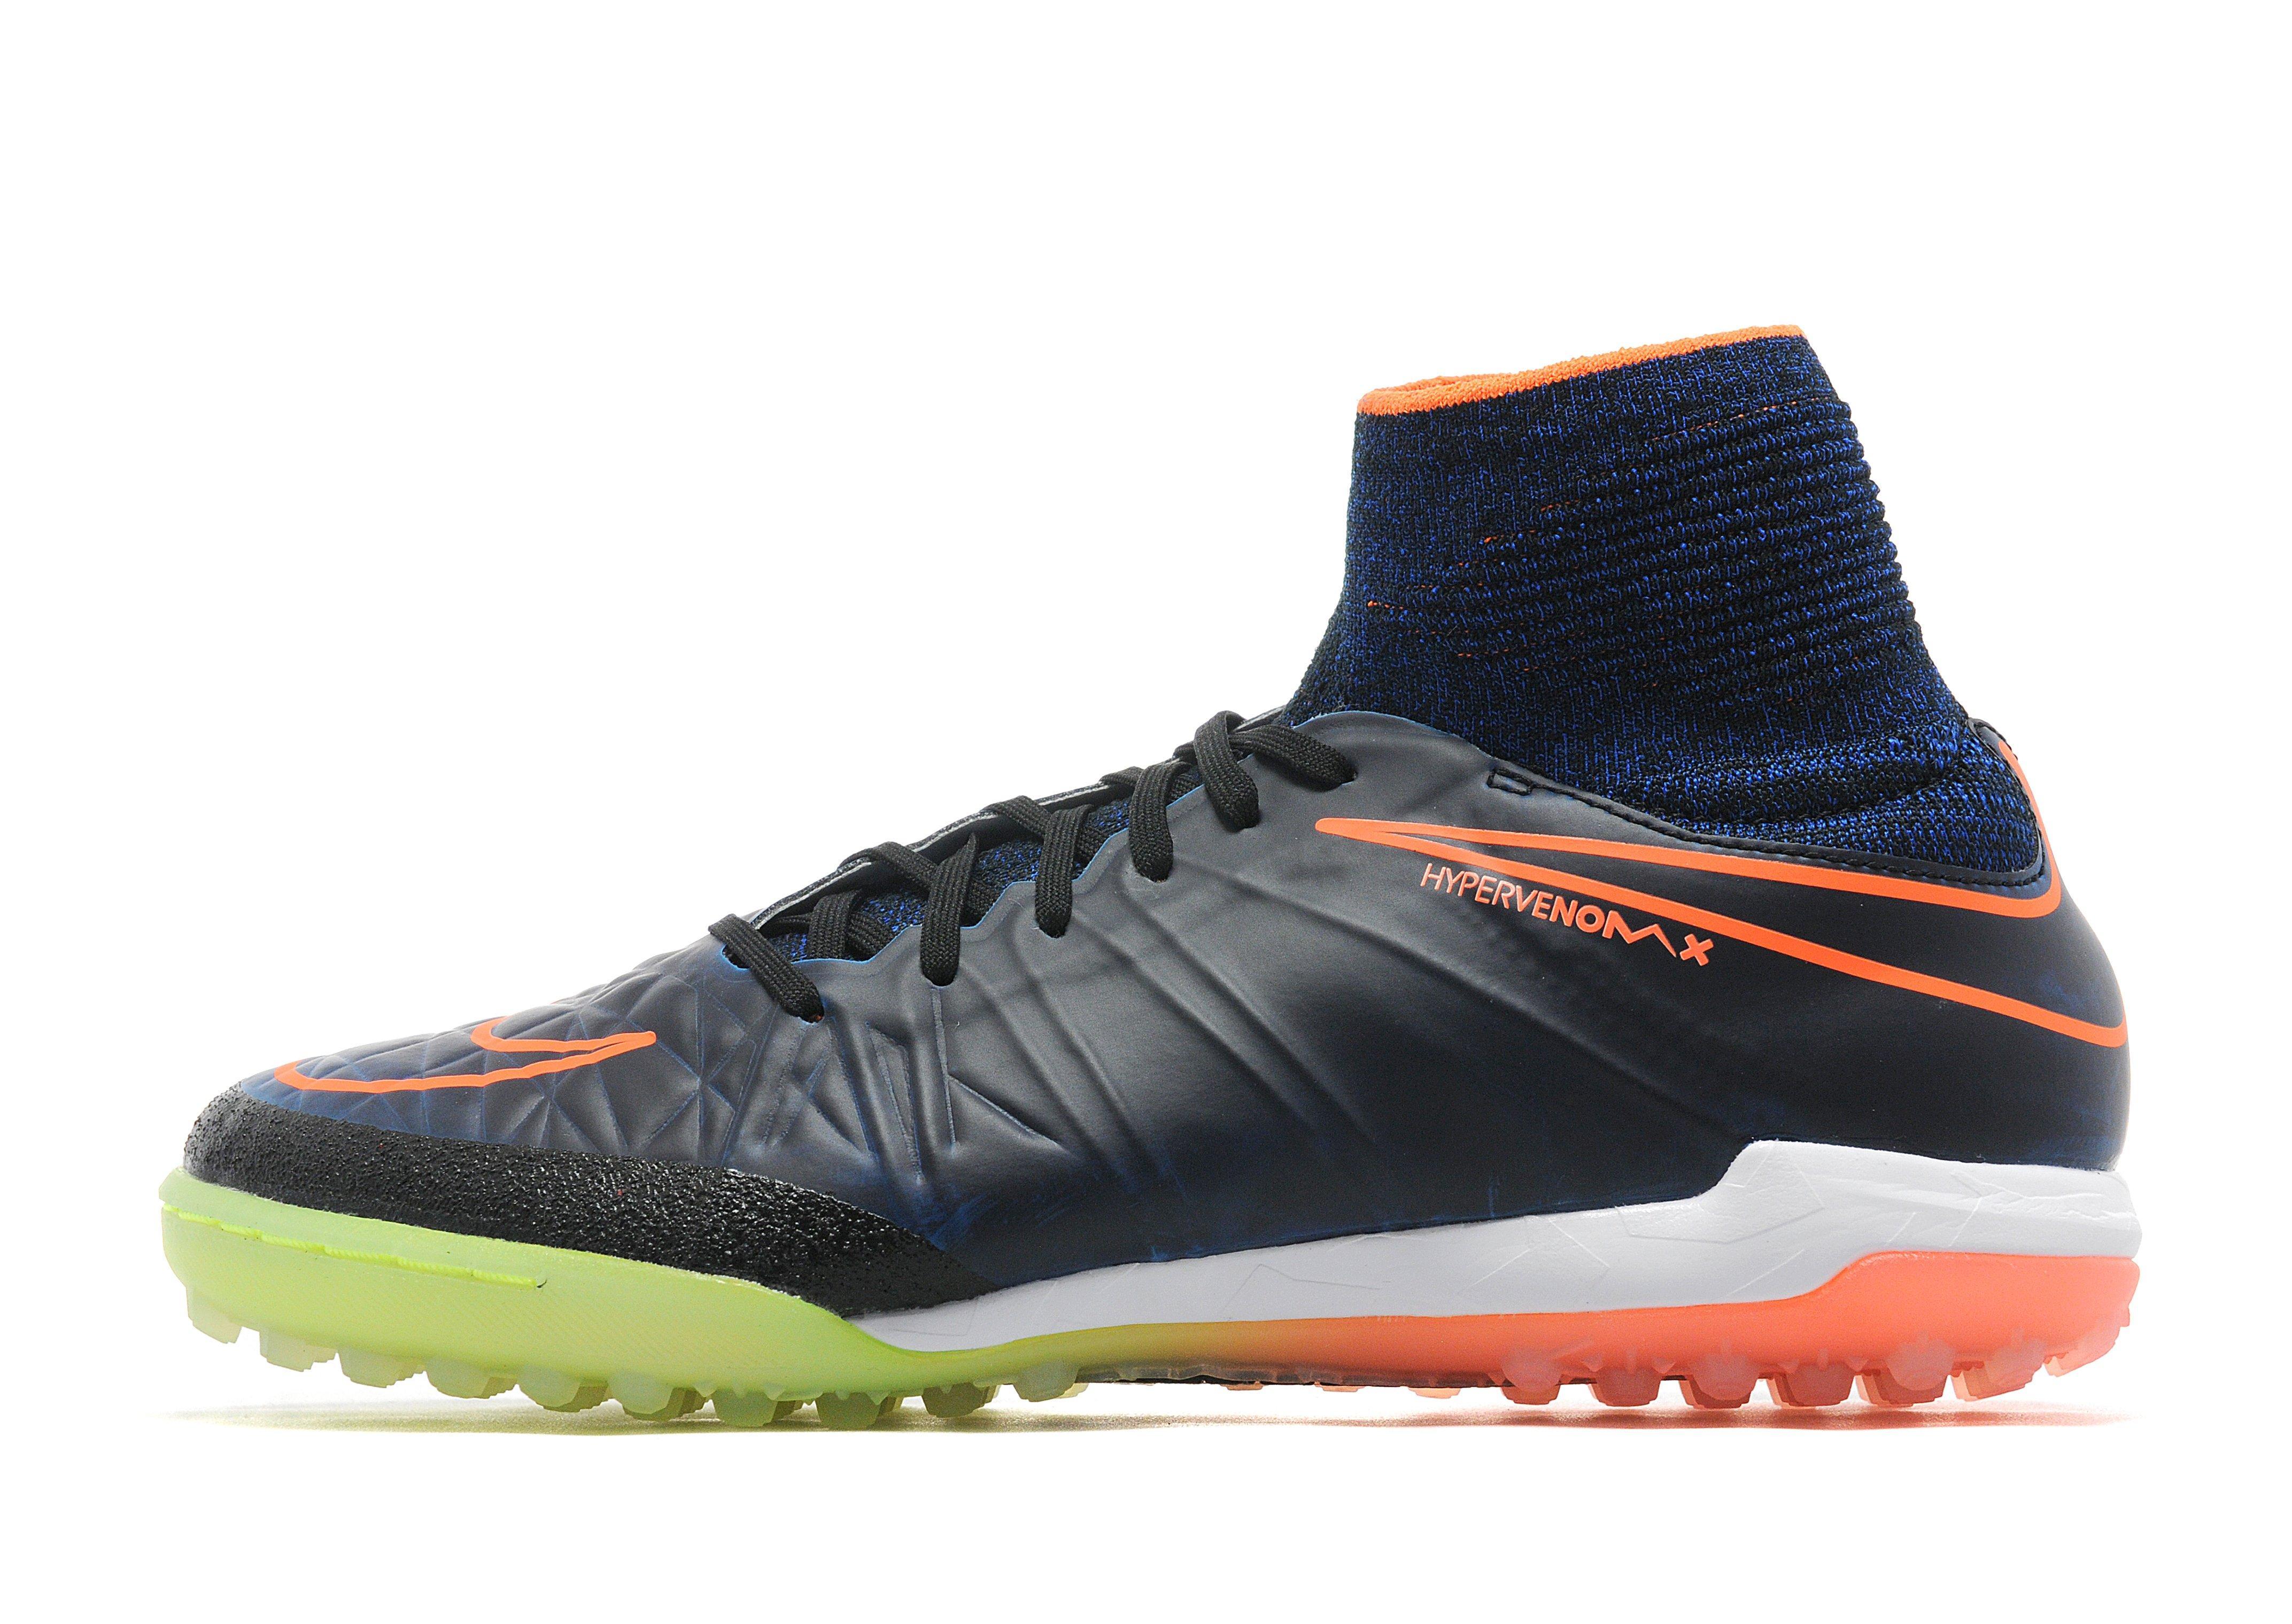 Nike Scarpe Per Offerta Bambino Offerta Per Scarpe Nike Bambino 0wyvmnO8NP